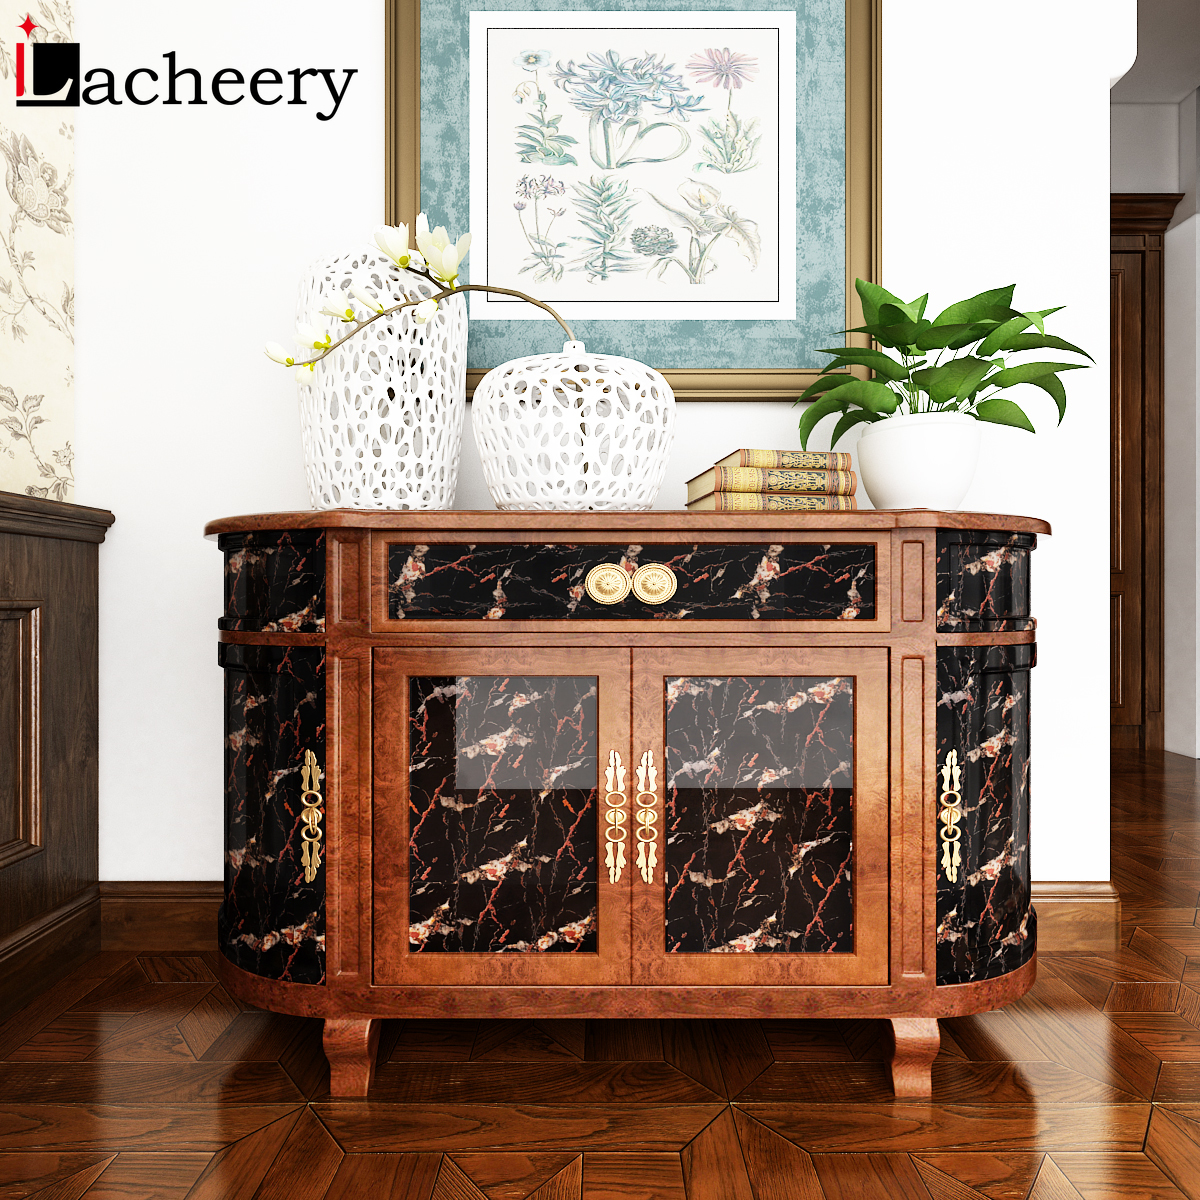 Modern Living Room Furniture Desktop Waterproof Marble Wallpaper Vinyl DIY Self Adhesive Contact Paper Dining Table Home Decor